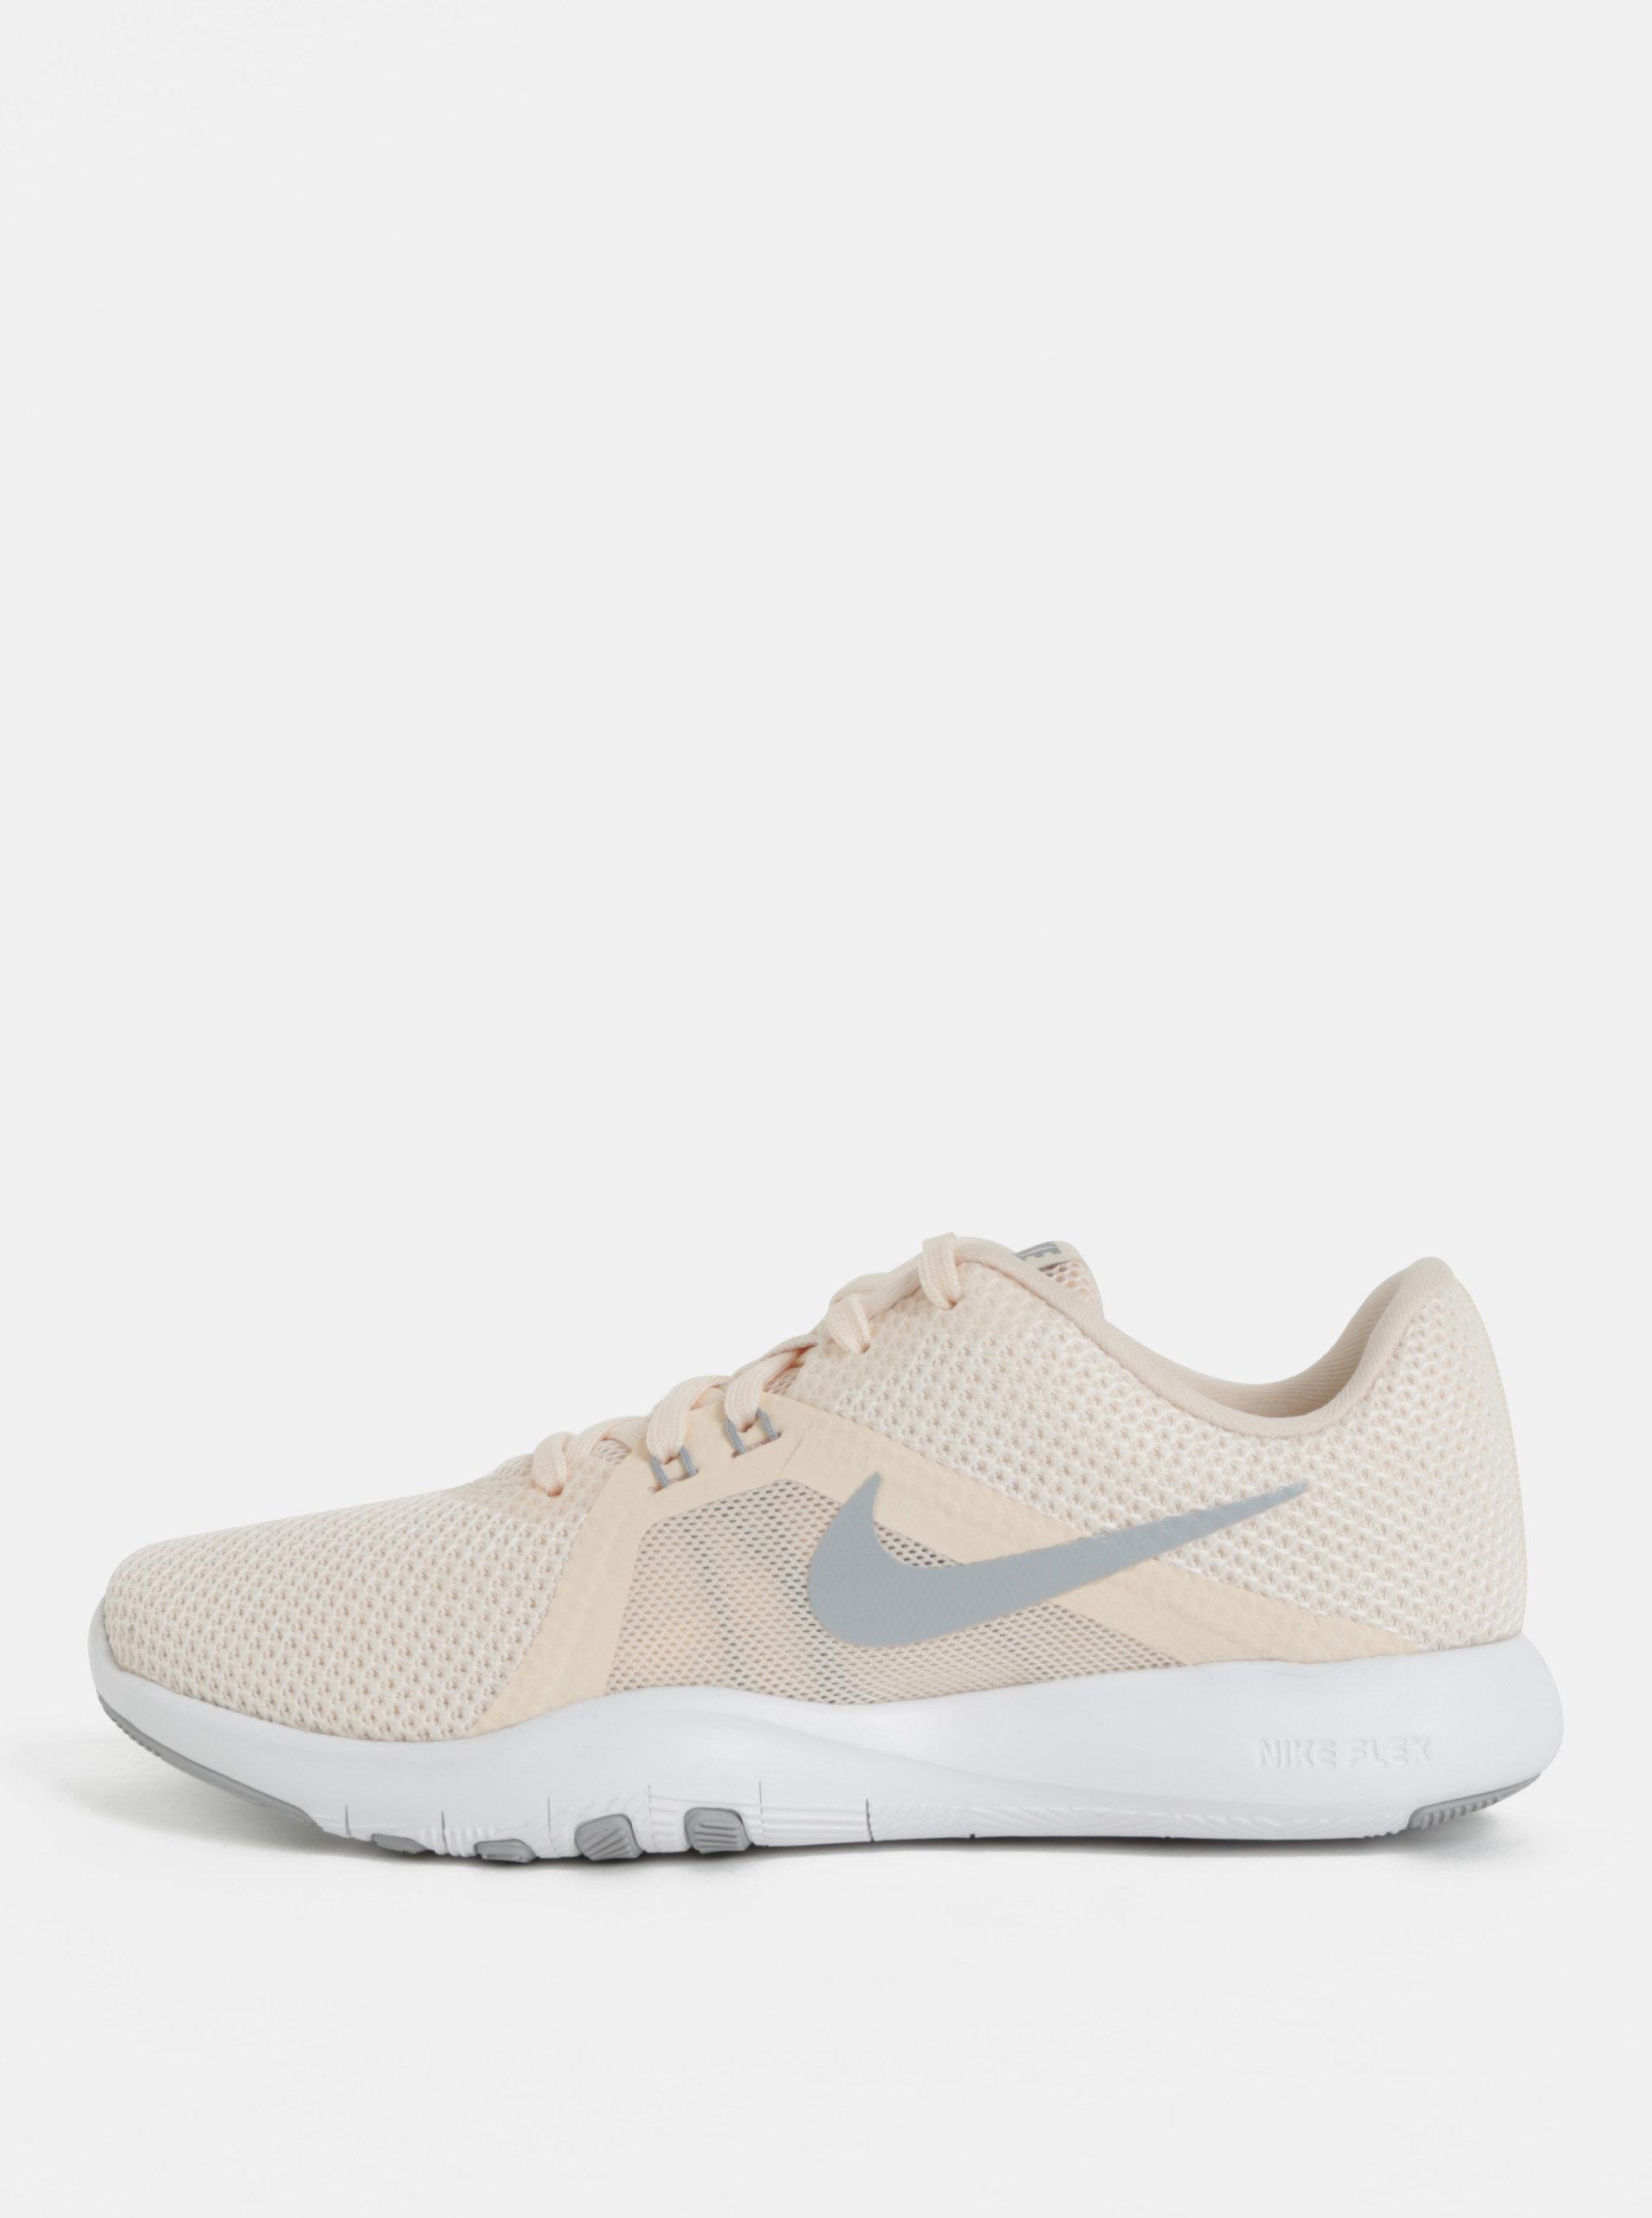 3a627f2fc82 Růžové dámské tenisky Nike Flex trainer 8 ...